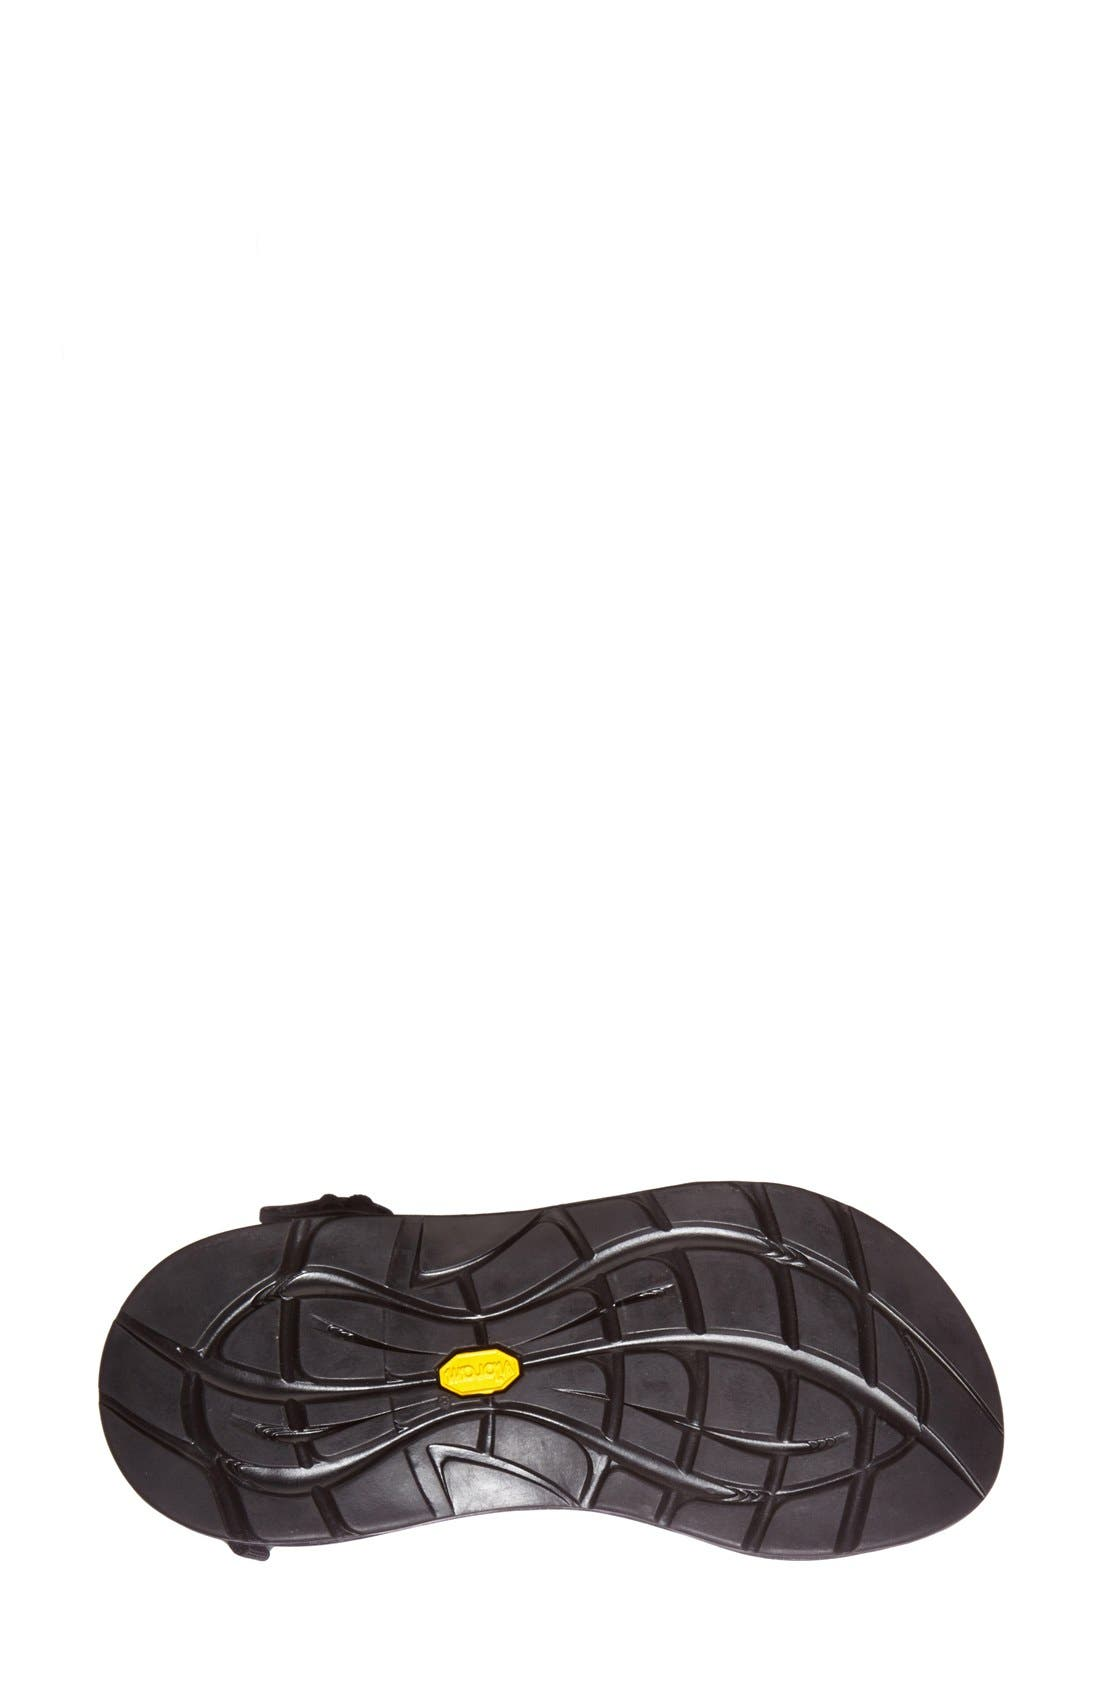 Alternate Image 3  - Chaco 'ZX1 Yampa' Double Strap Sport Sandal (Women)